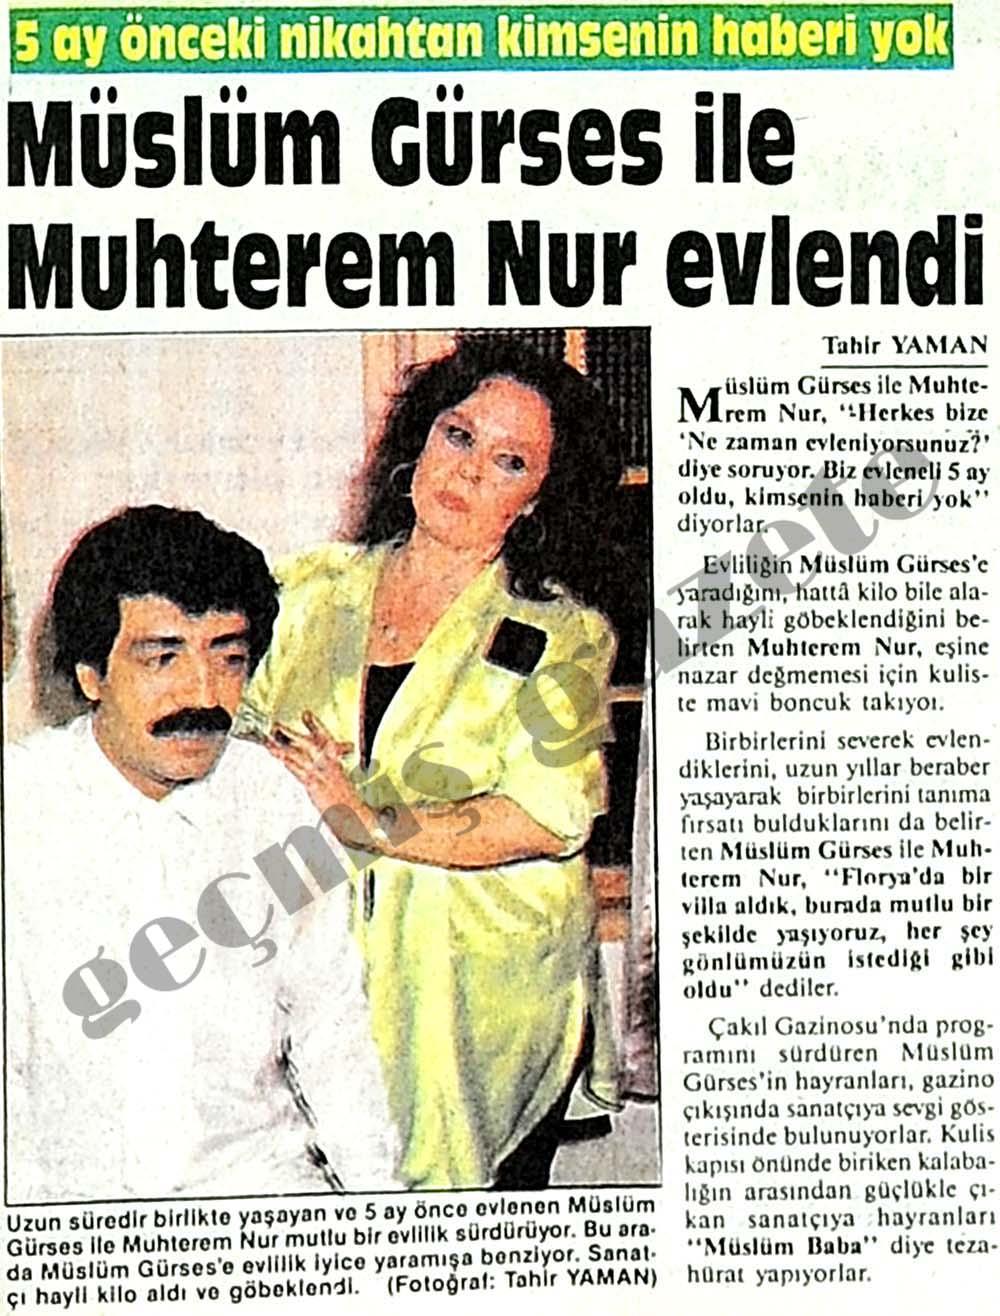 Gürses ile Nur evlendi